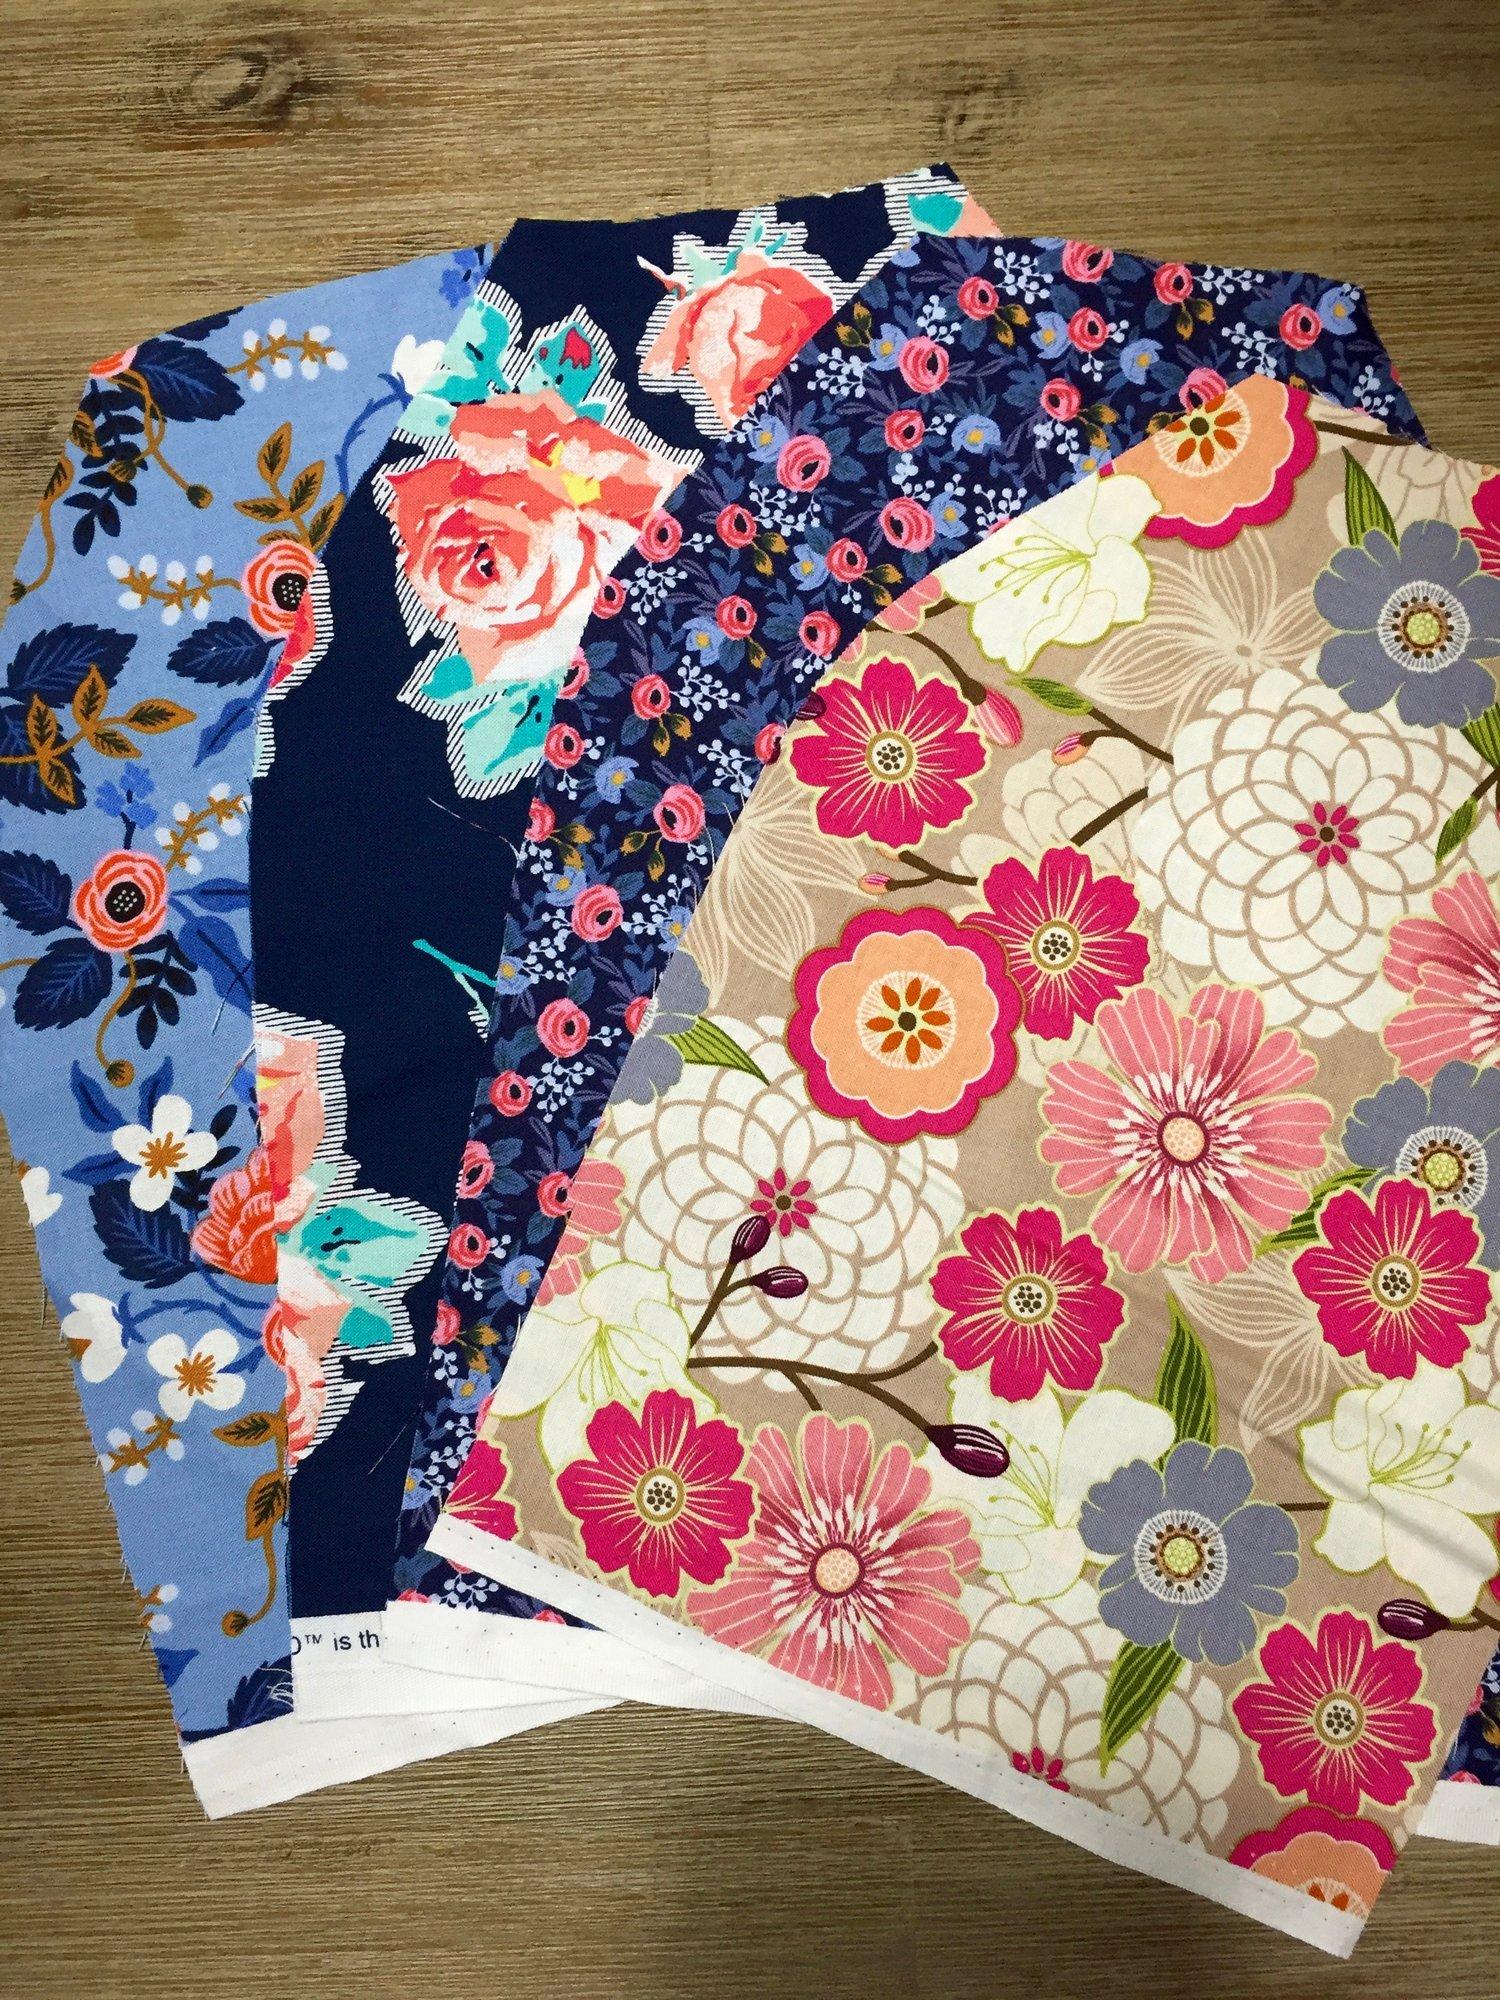 beautiful floral scrap pack 40 piece fabric scrap pack of flower